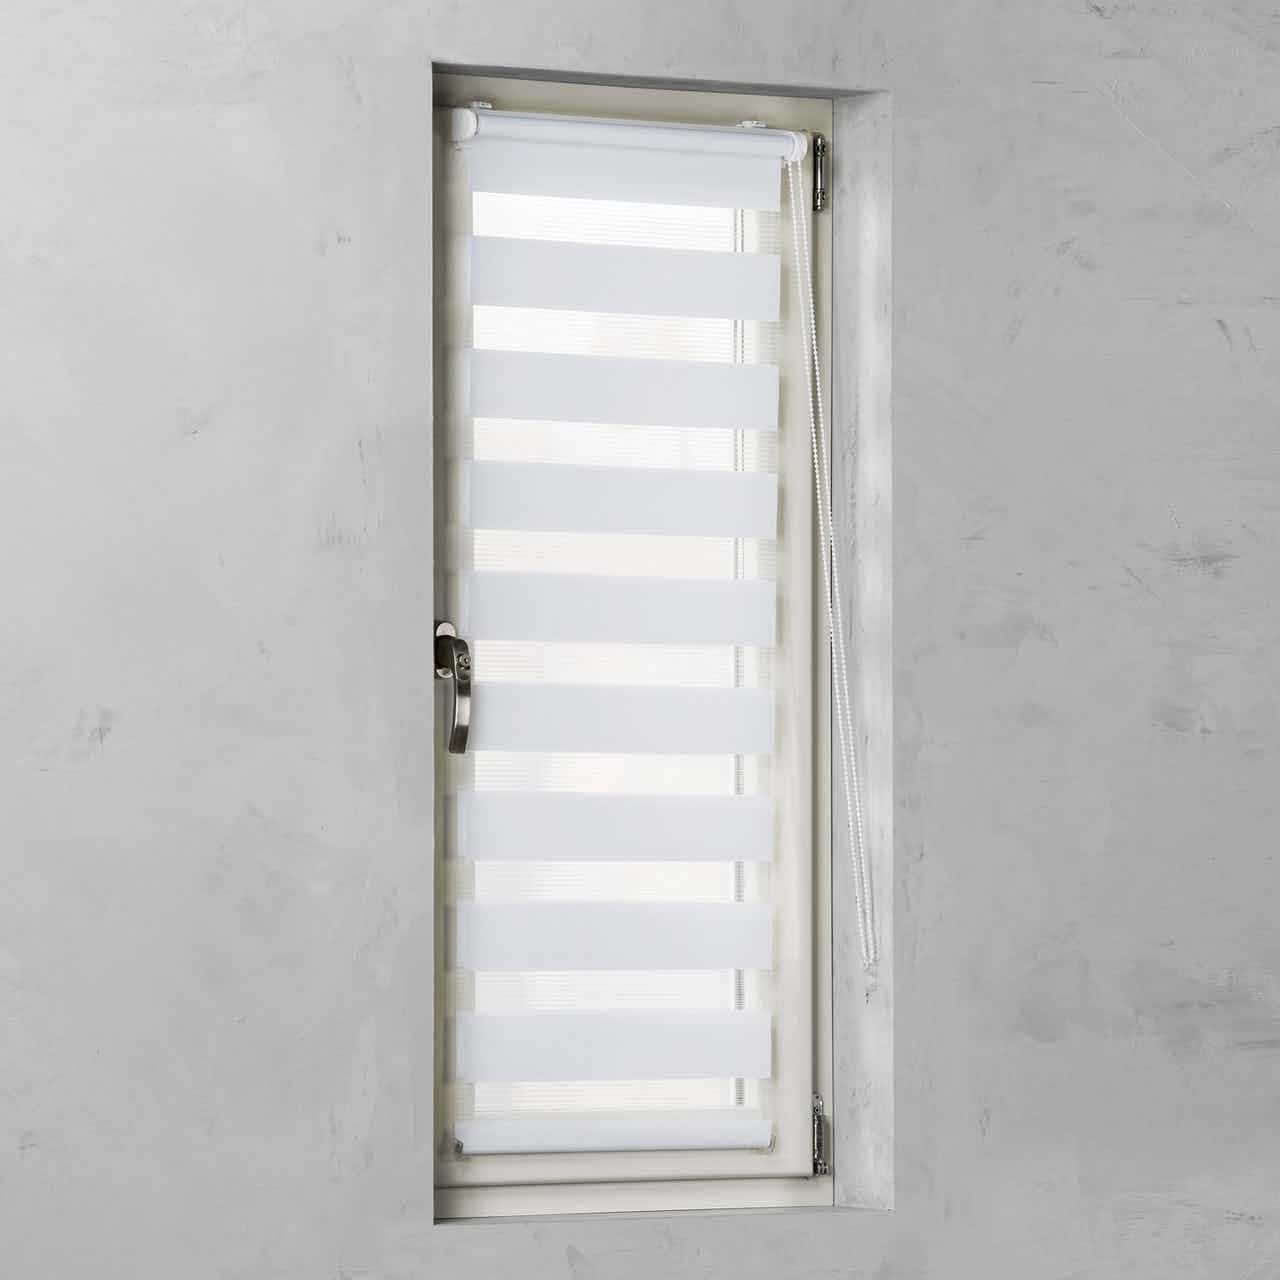 Cocoon Easy Fix Doppelrollo Tageslicht Weiß 45 cm x 150 cm